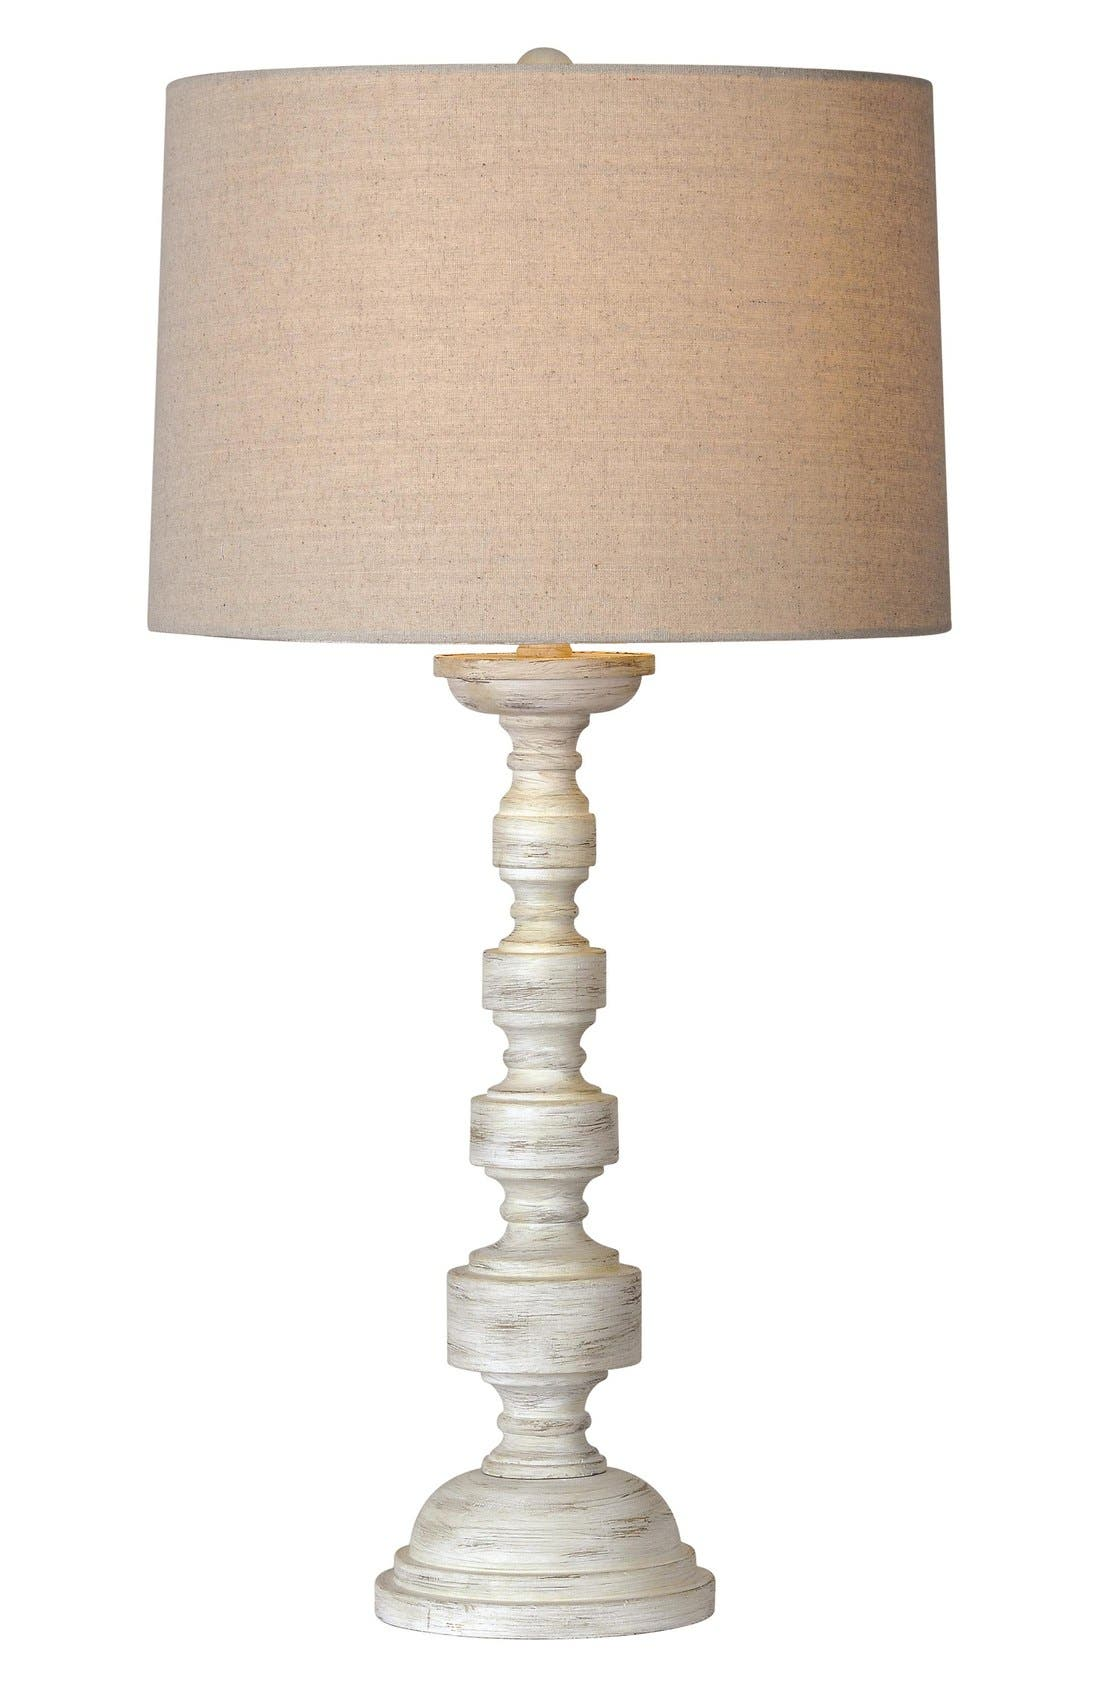 Main Image - Renwil'Chelsea' Table Lamp